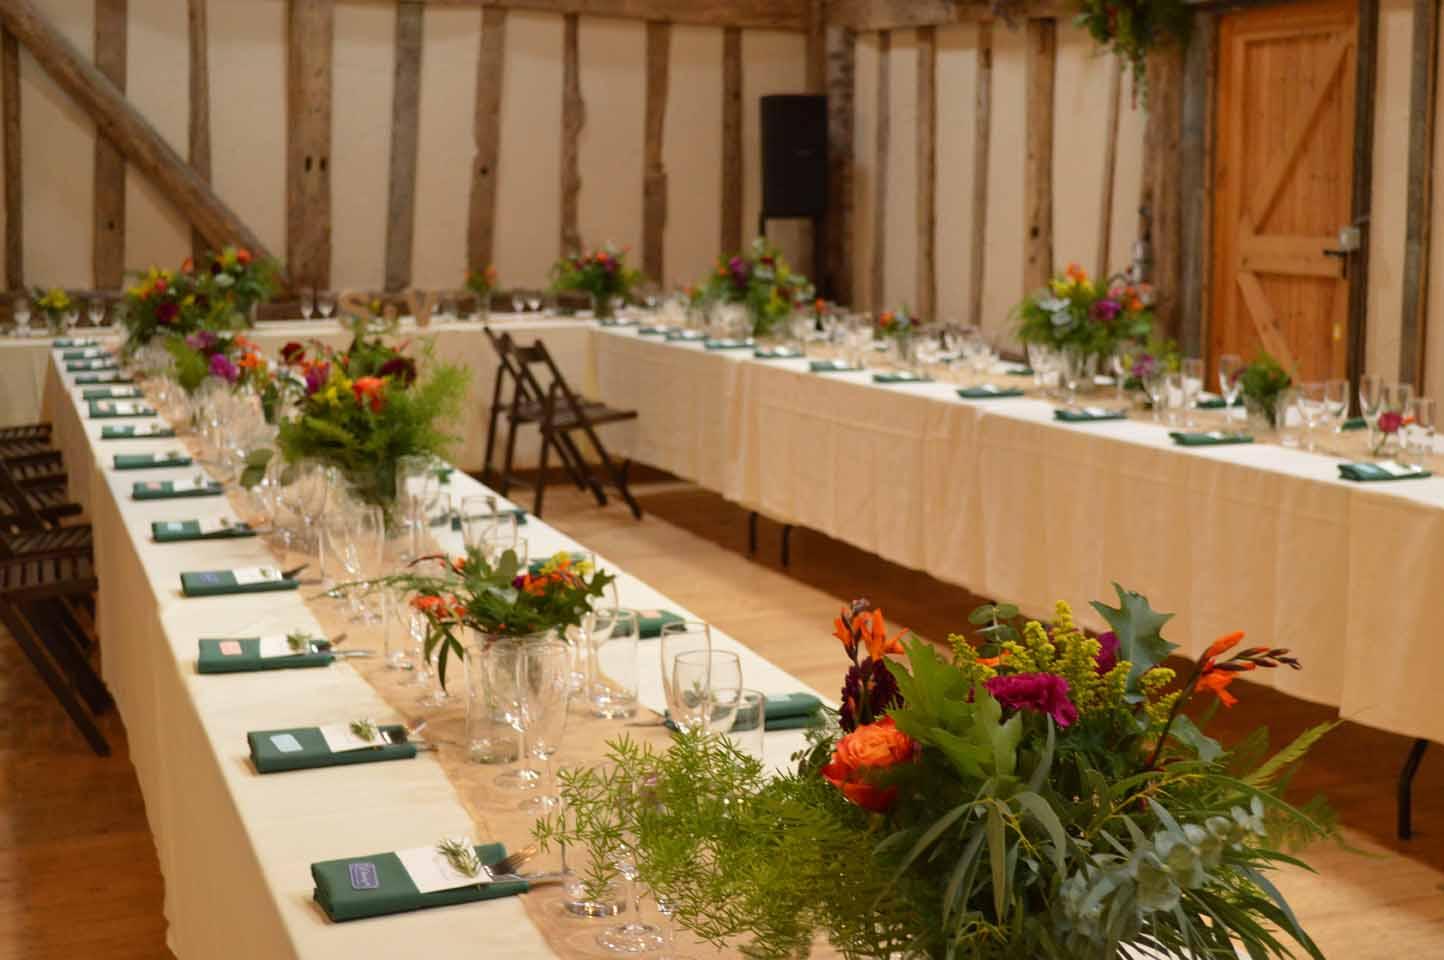 patricks barn wedding chiddinglye table flowers